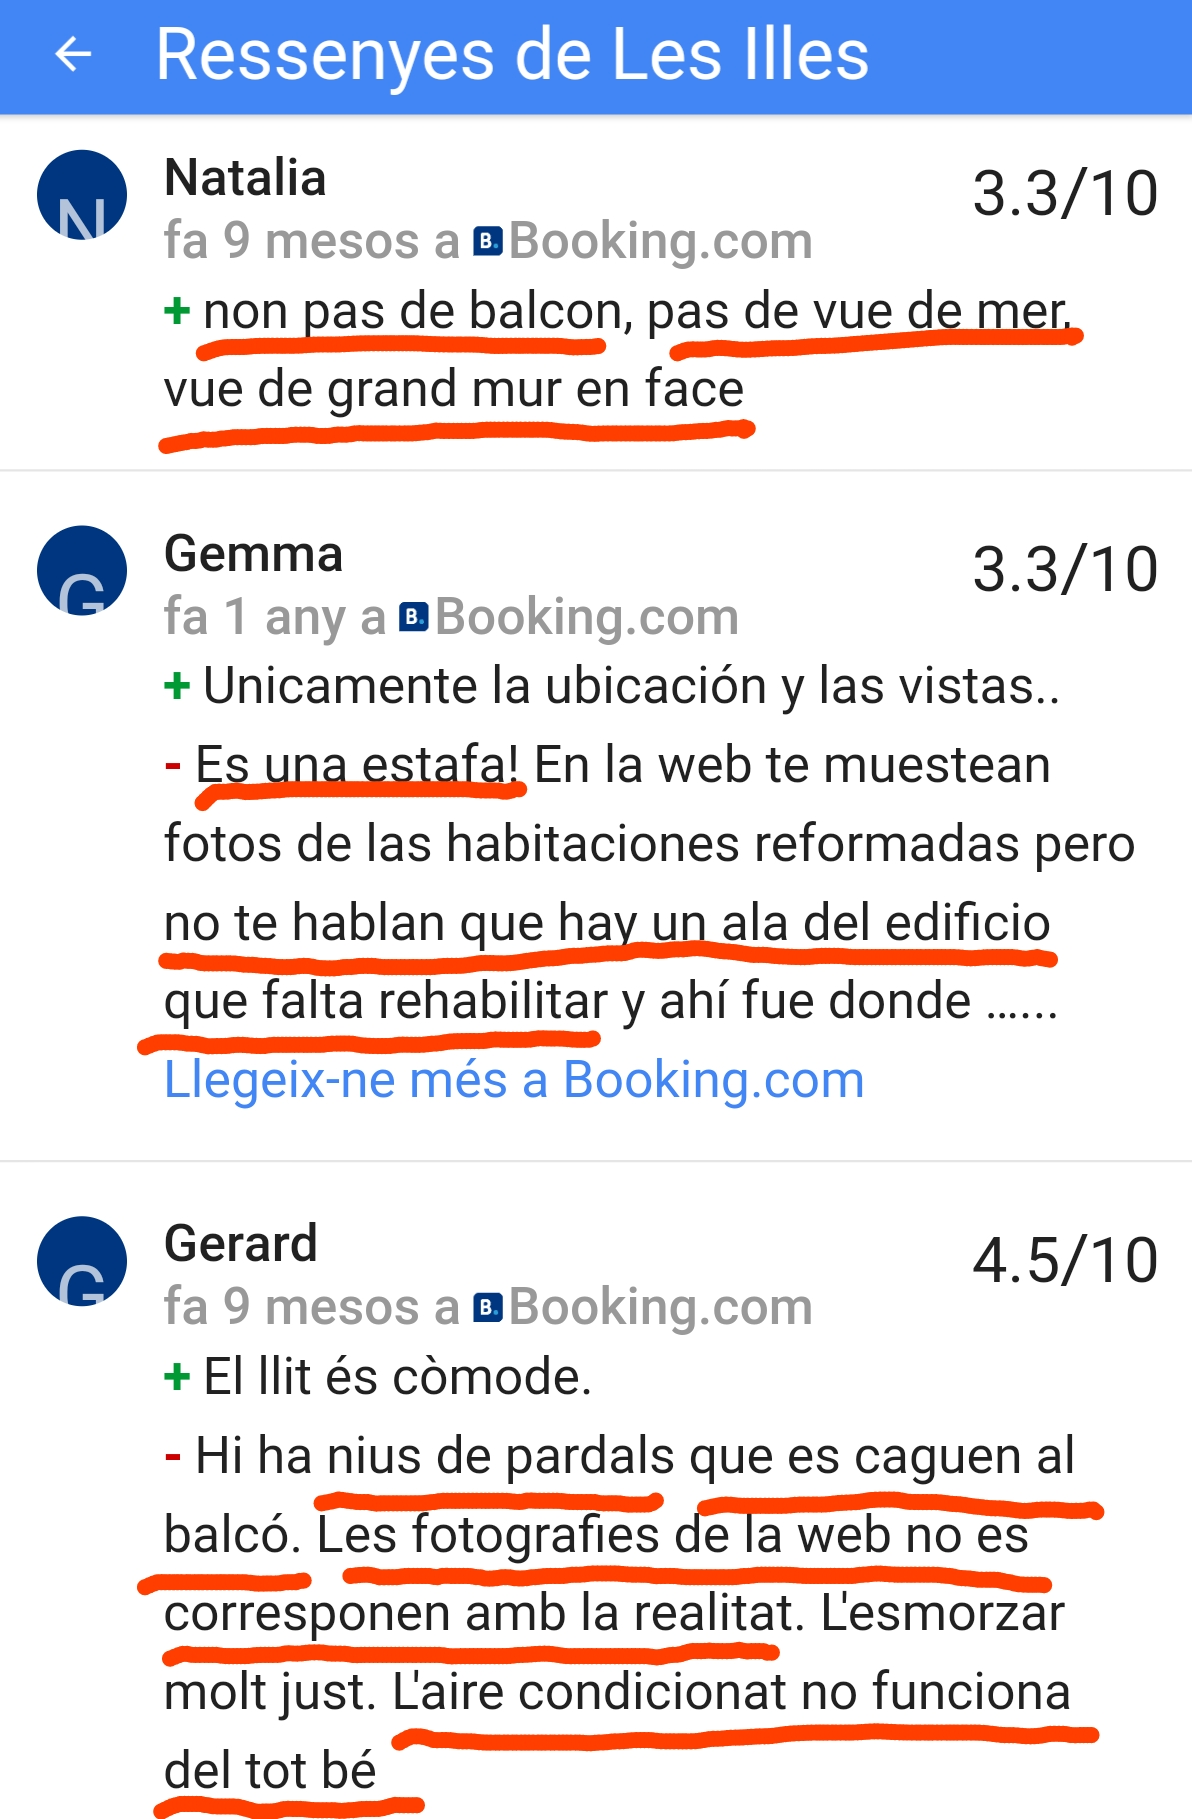 Hotel les illes estartit booking 20